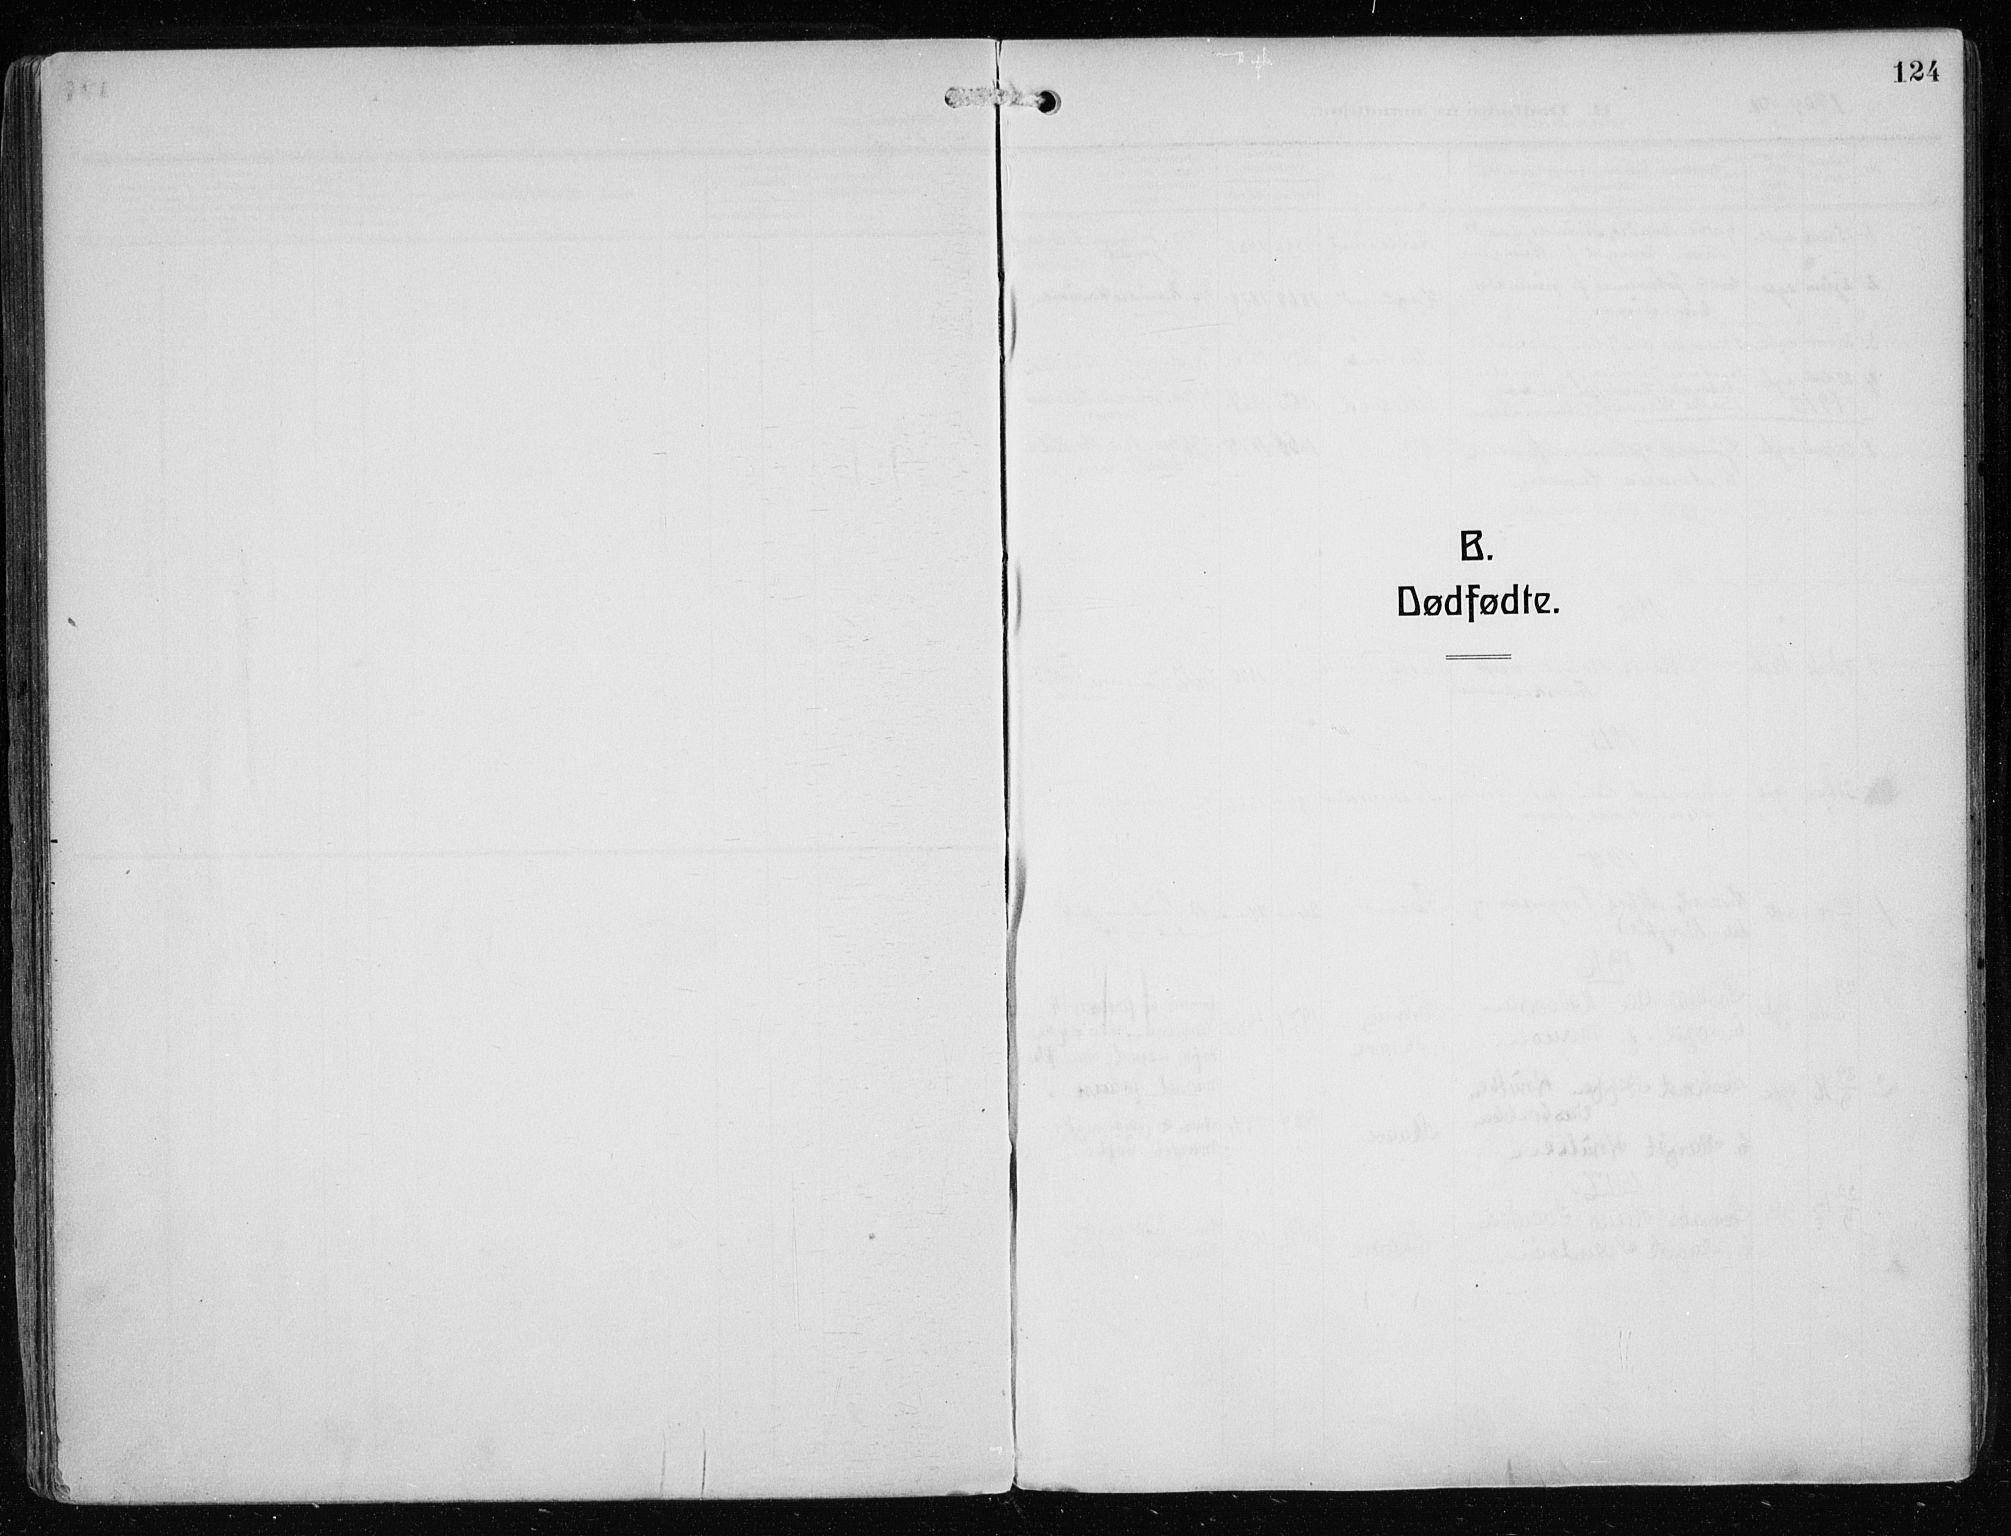 SAST, Haugesund sokneprestkontor, H/Ha/Haa/L0010: Ministerialbok nr. A 10, 1909-1935, s. 124